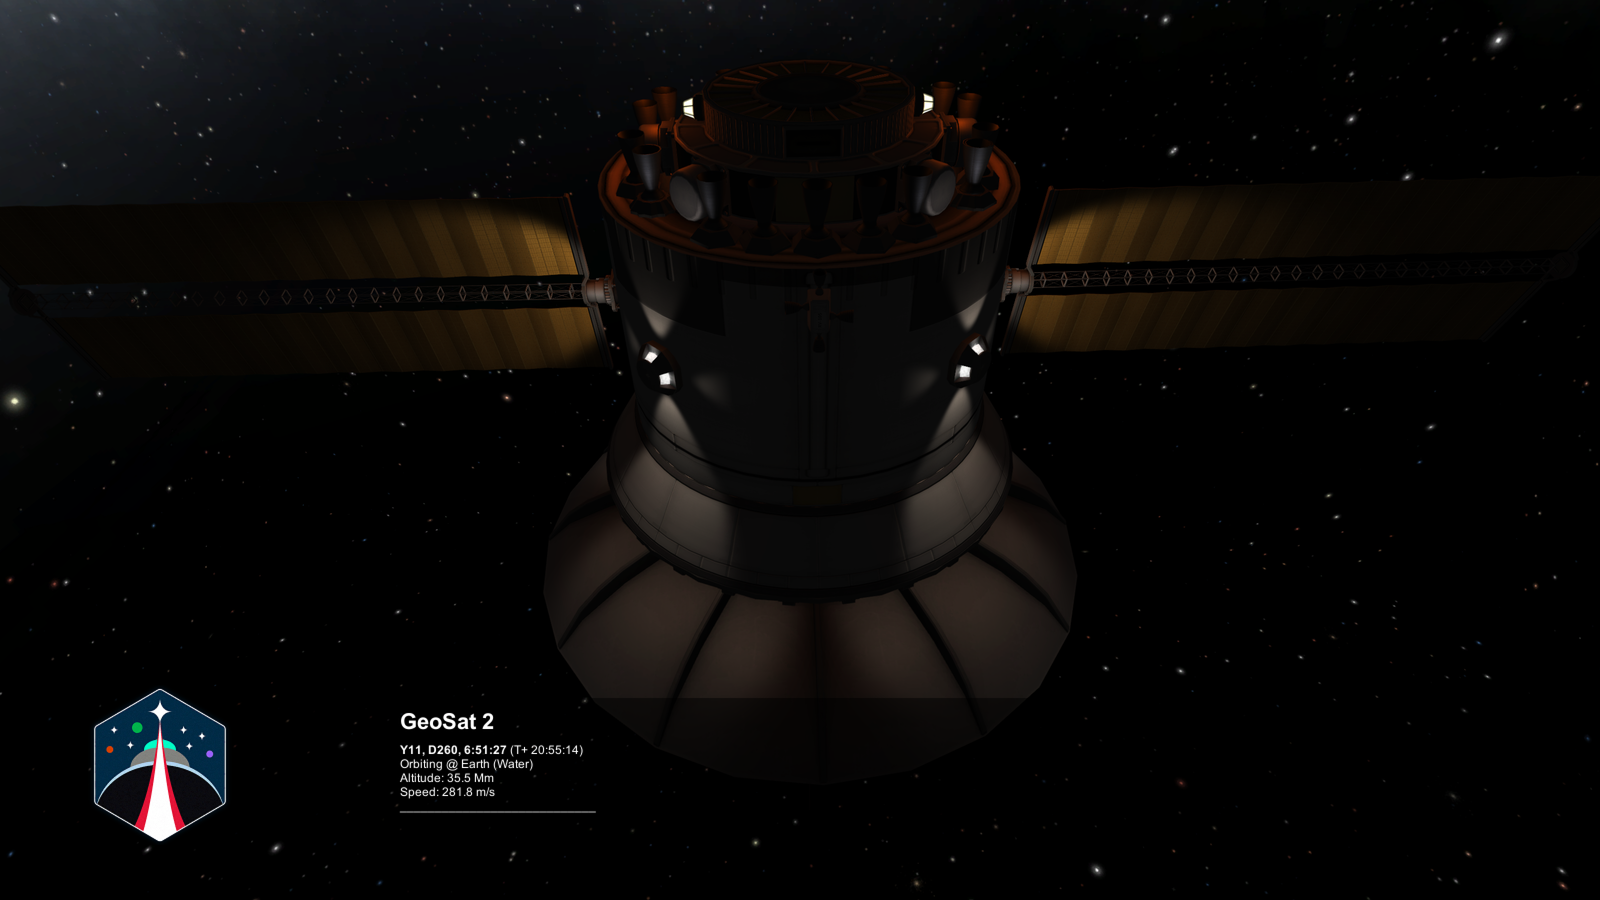 KSP: RSS] Строительство станции на орбите Земли (часть 1)